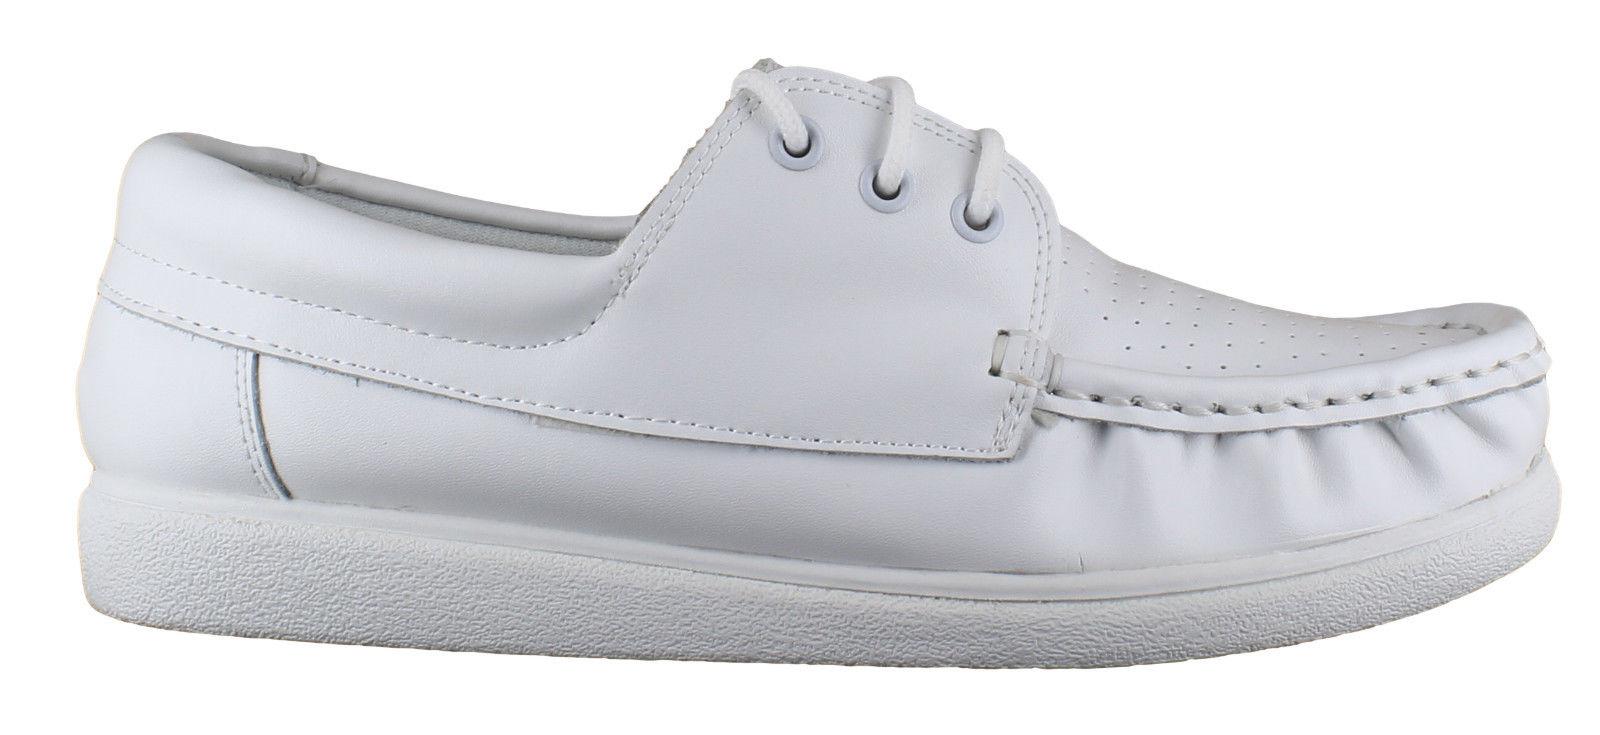 Mens 14 Bowling Shoes Size